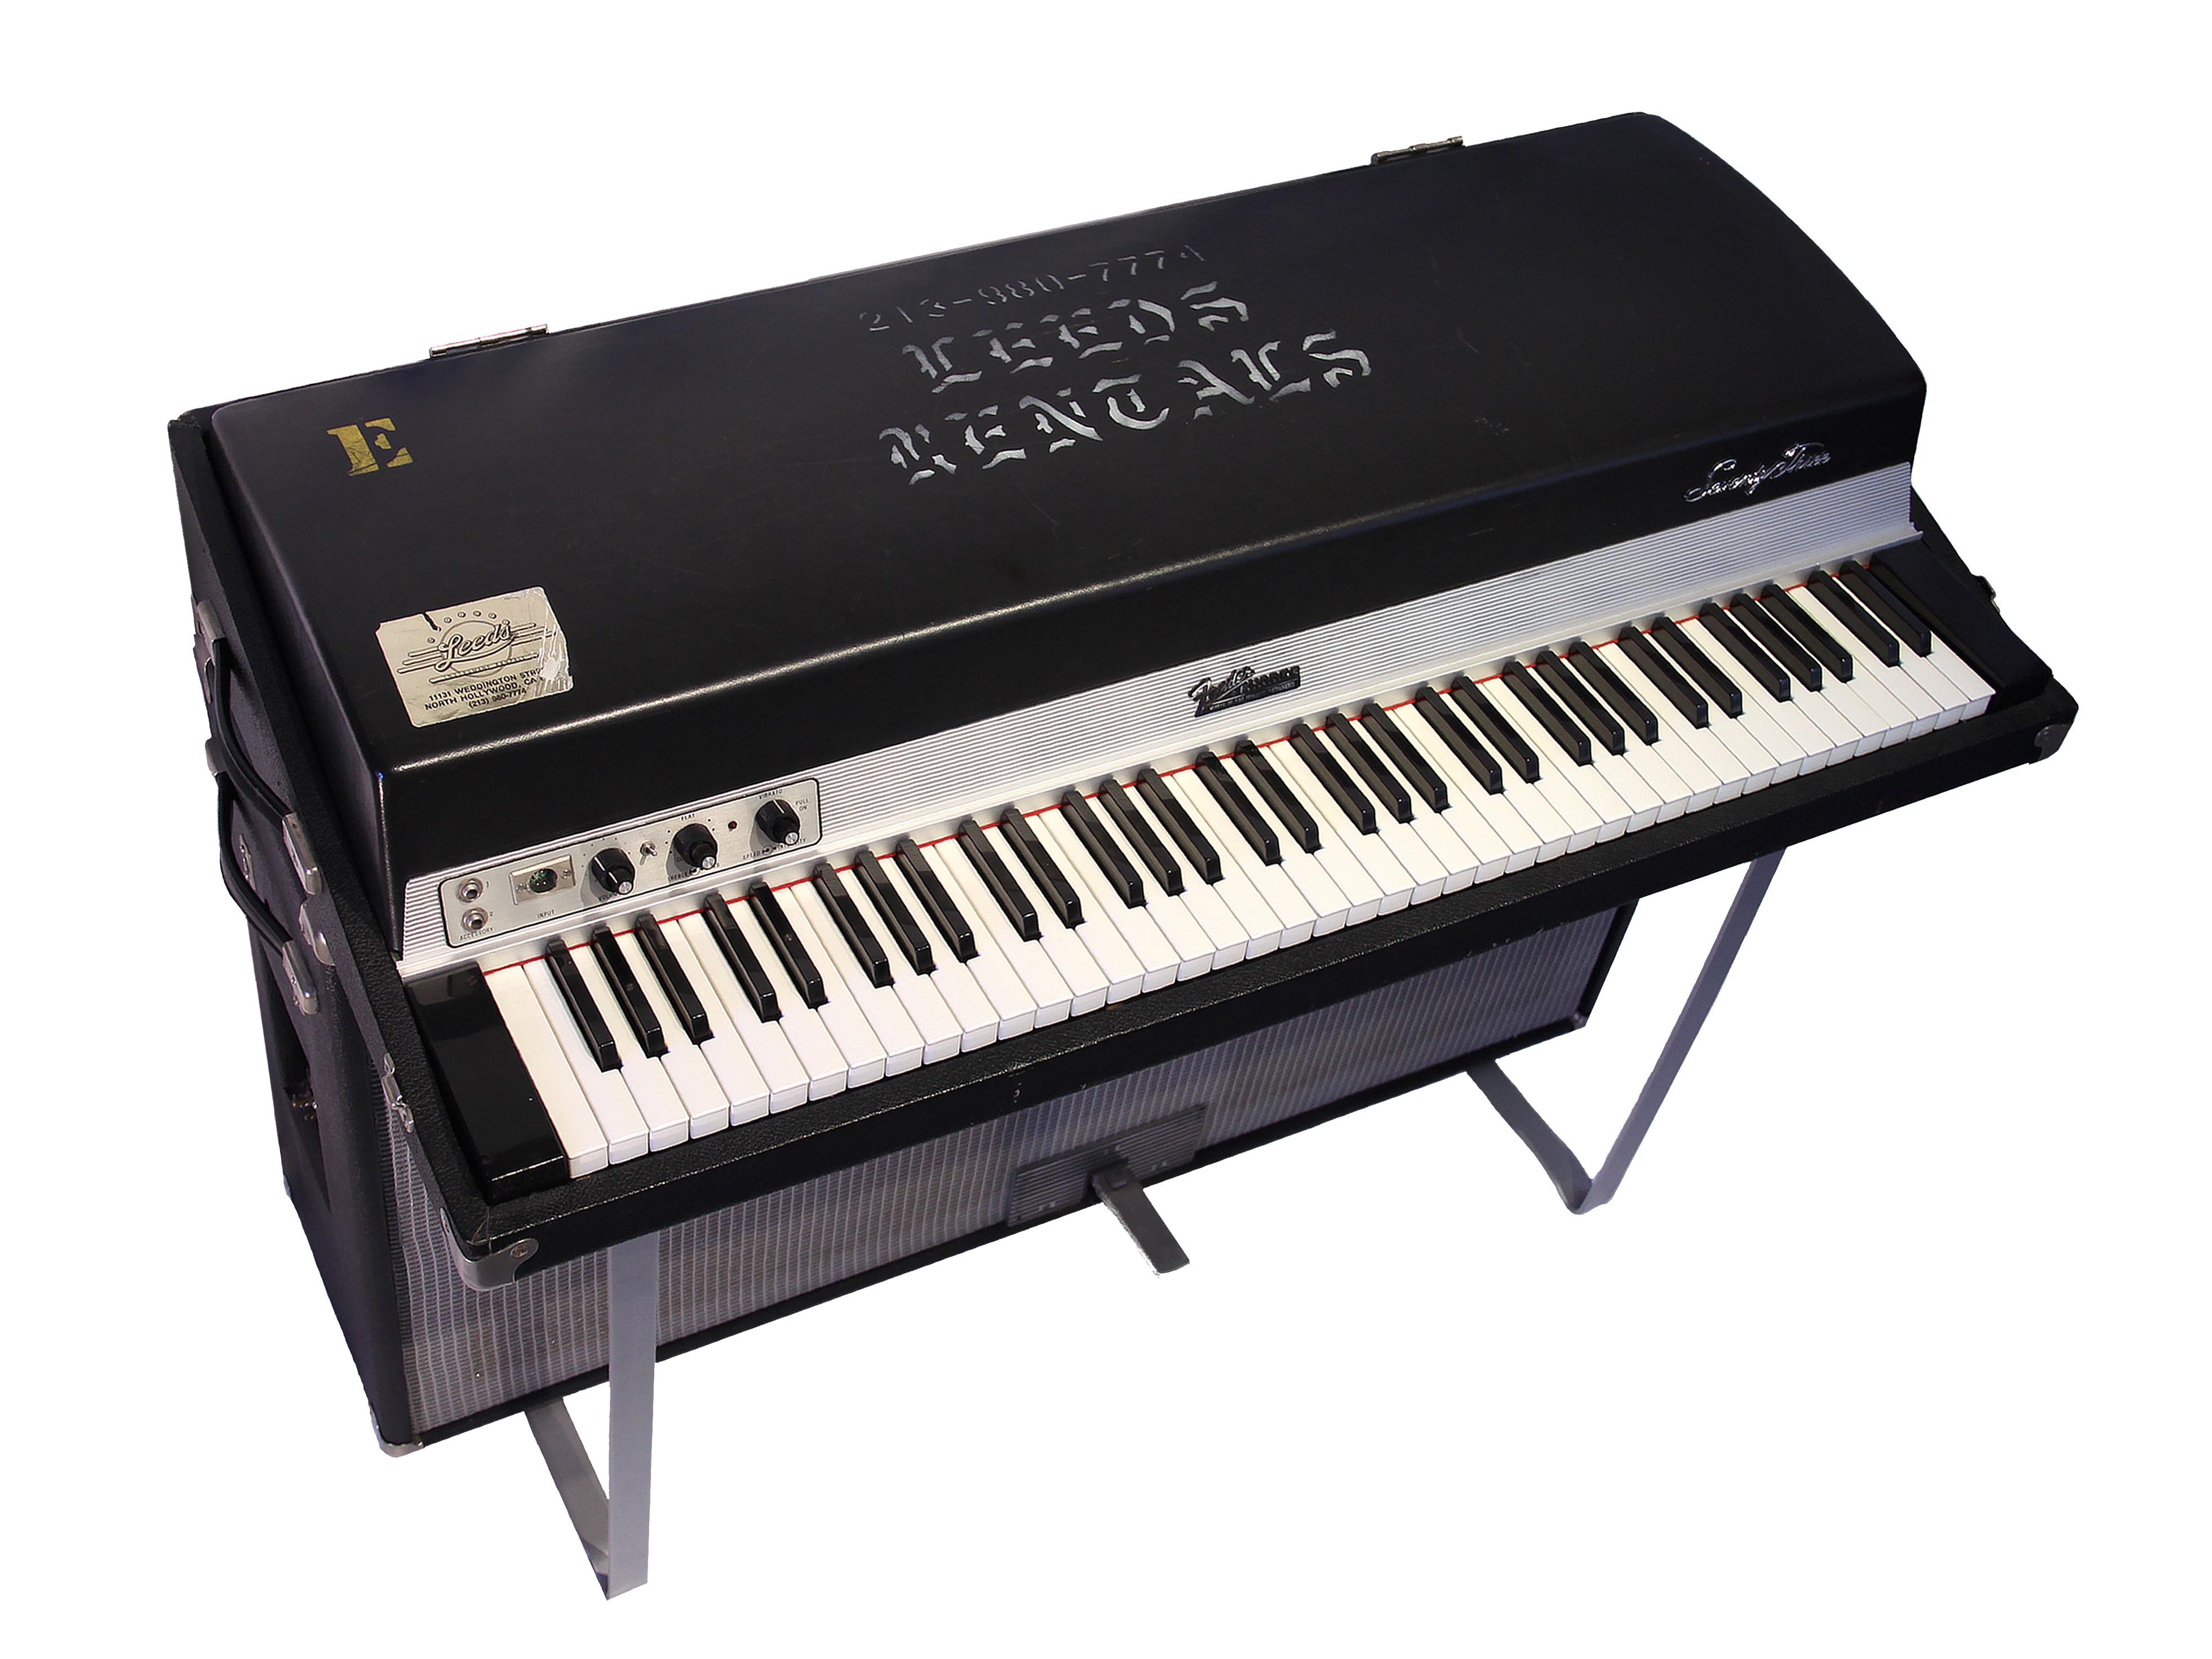 The E Model Rhodes